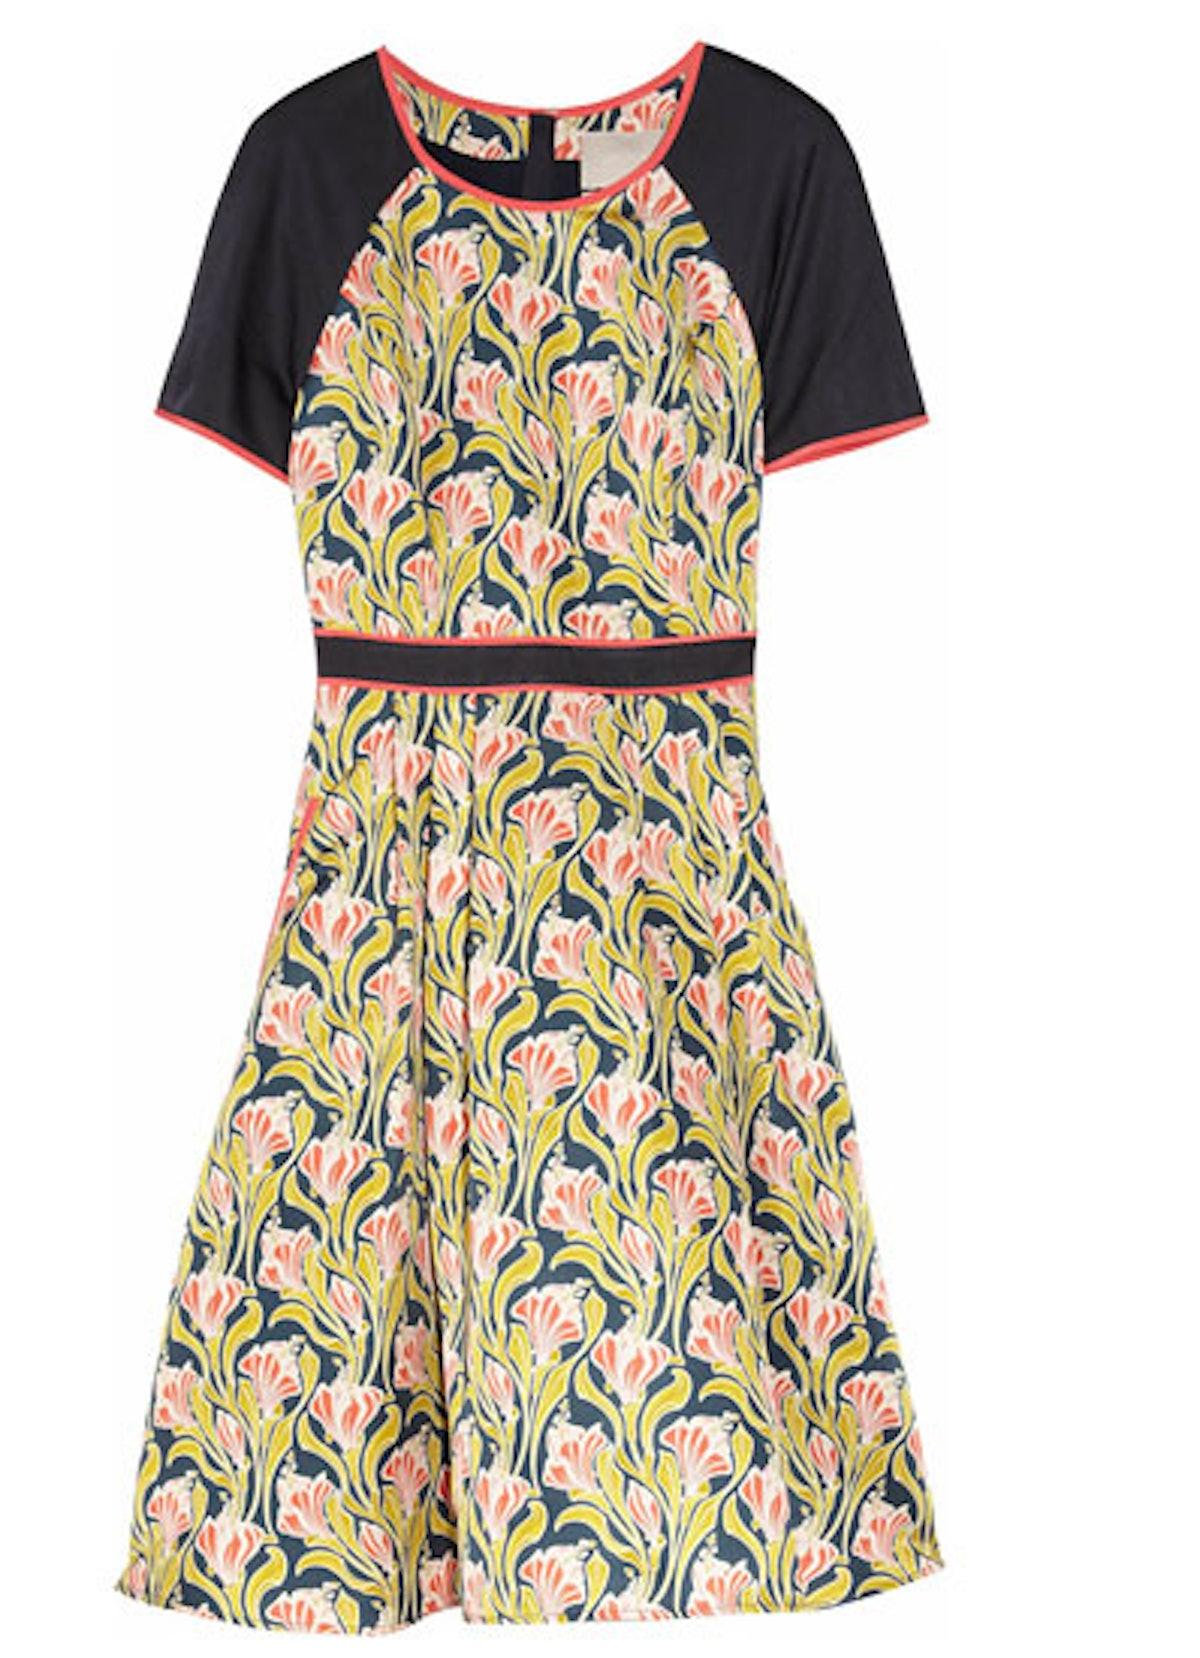 fass-floral-dresses-02-v.jpg